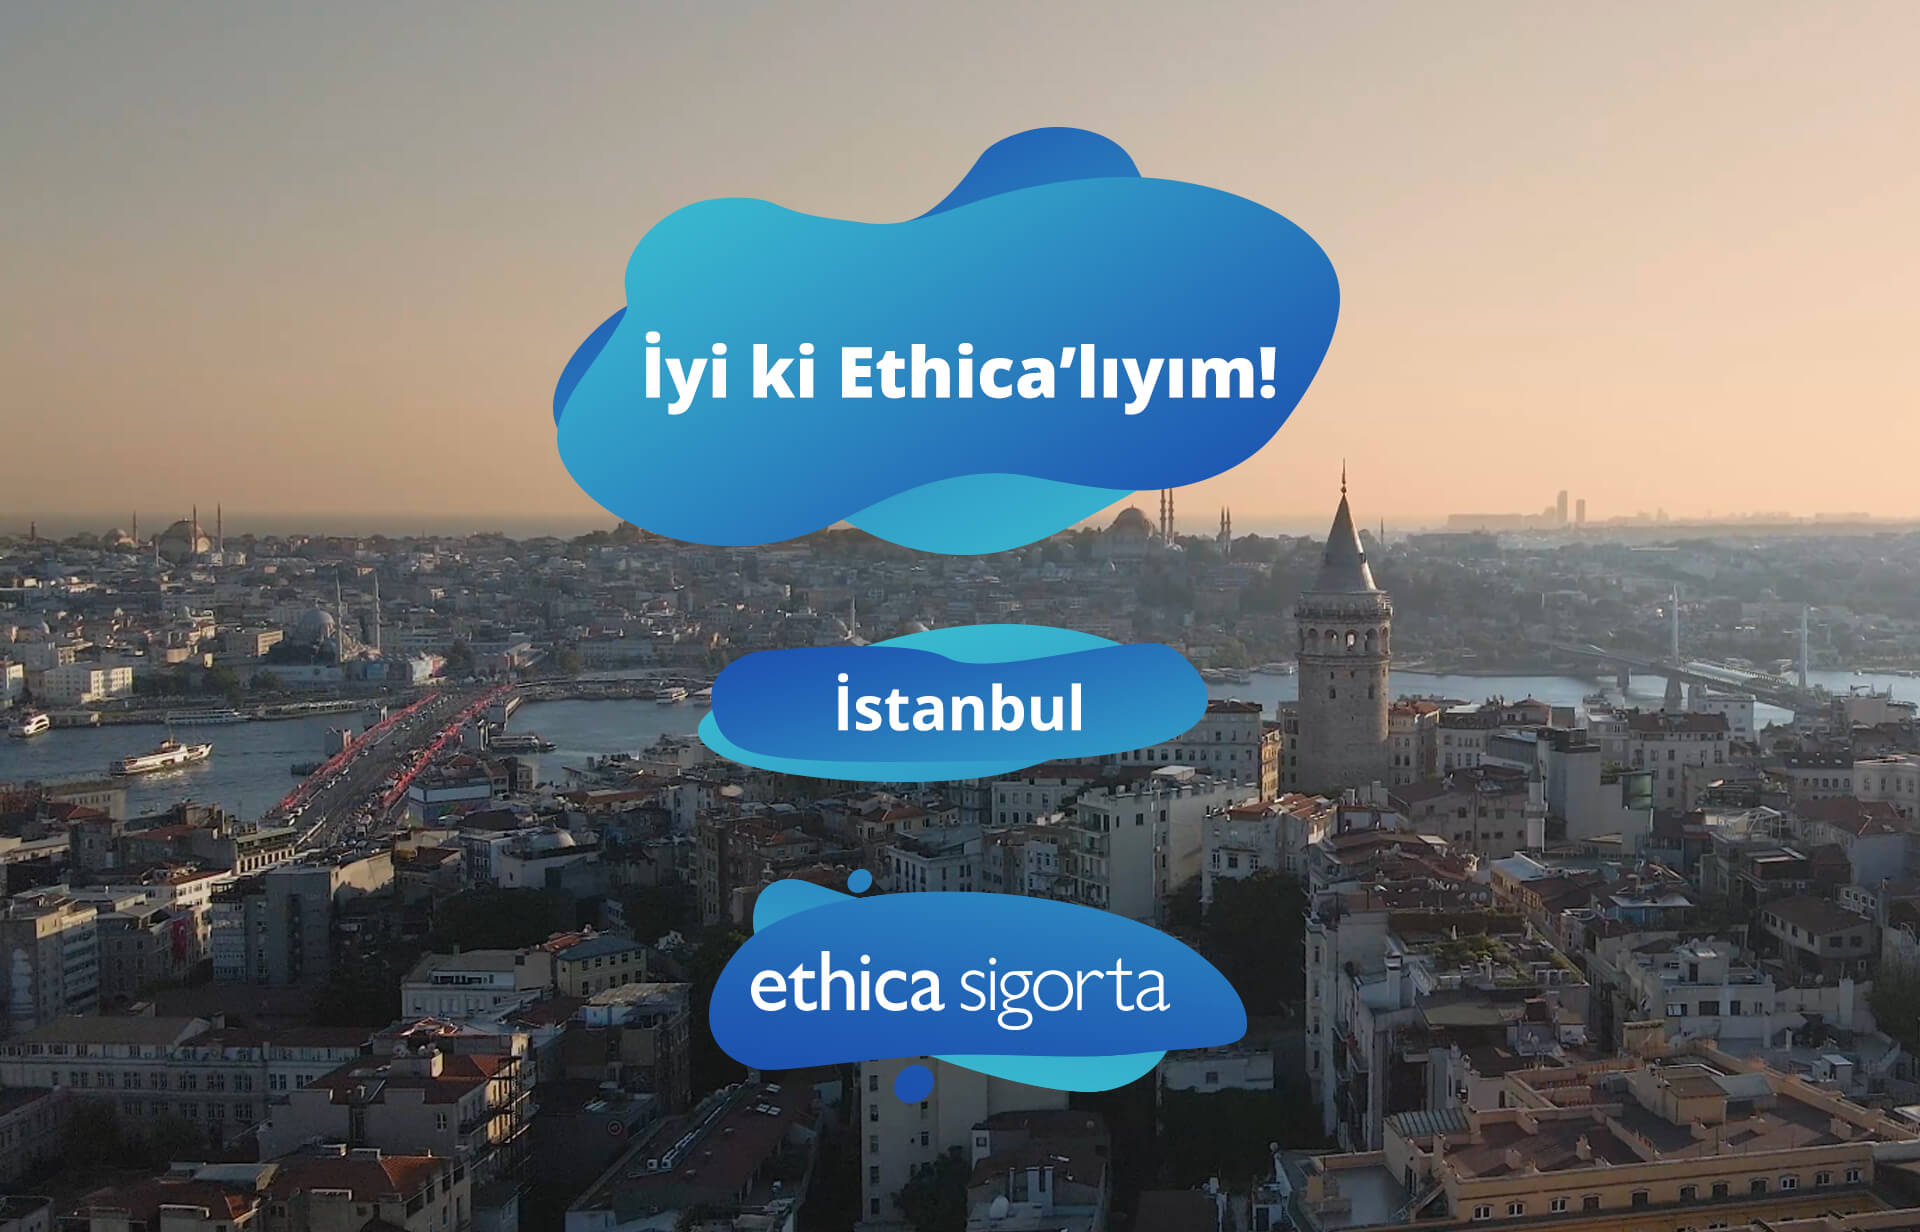 Ethica_İstanbul_1920x1232.jpg